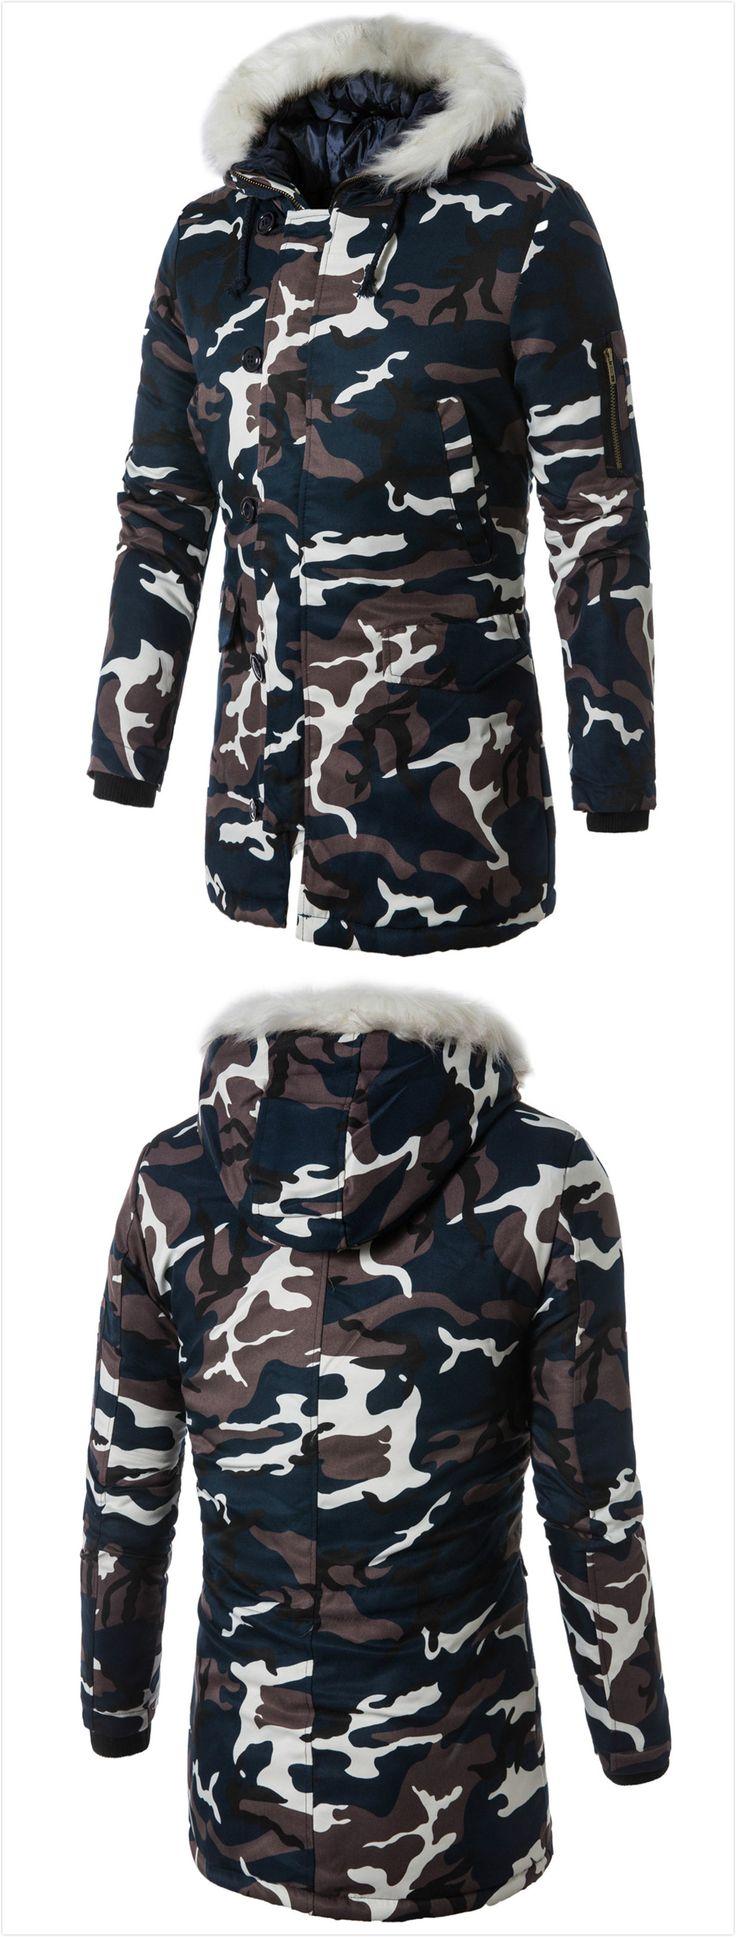 Zip Up Camo Faux Fur Hooded Coat,sammydress,sammydress.com